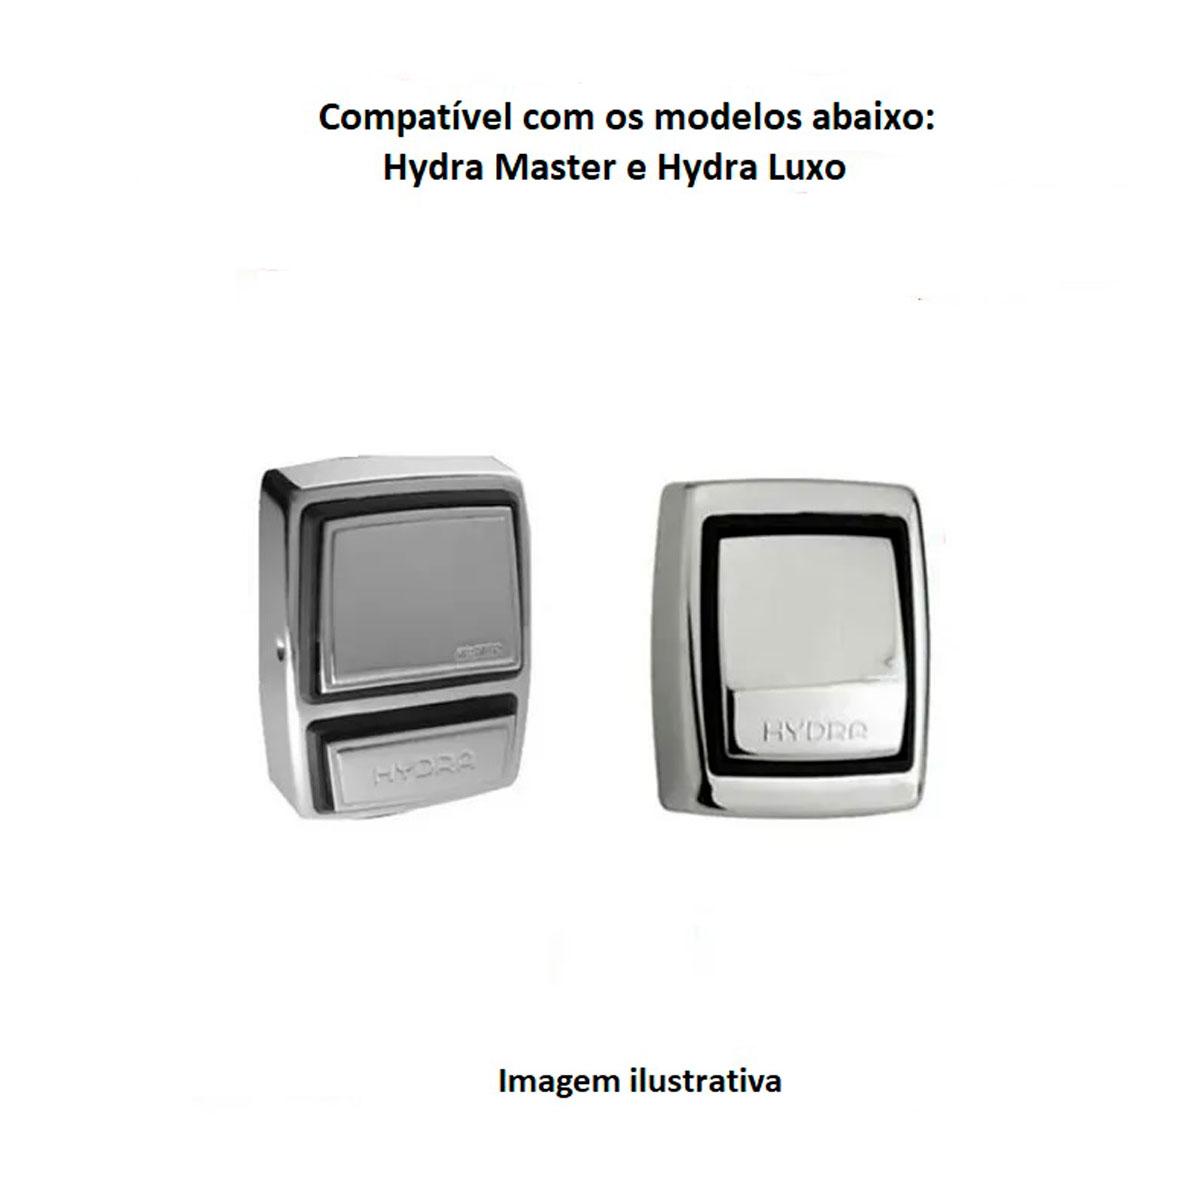 Contra Sede Hydra Luxo 1.1/4 Blukit